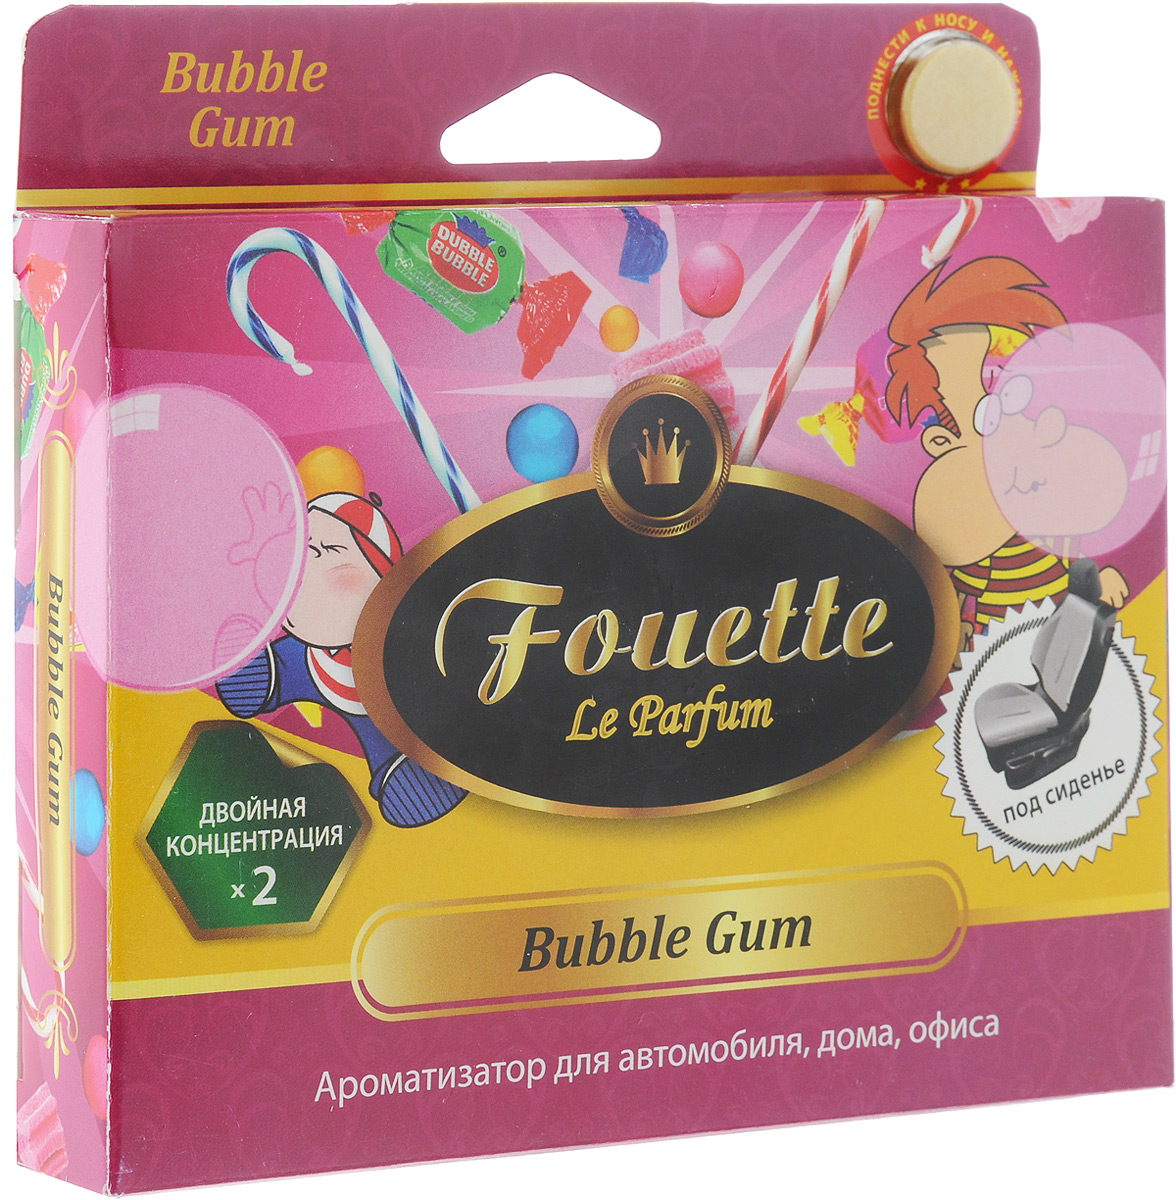 Ароматизатор для автомобиля Fouette Collection Aromatique. Bubble Gum, под сиденье, 200 г ароматизатор подвесной fouette aroma box bubble gum